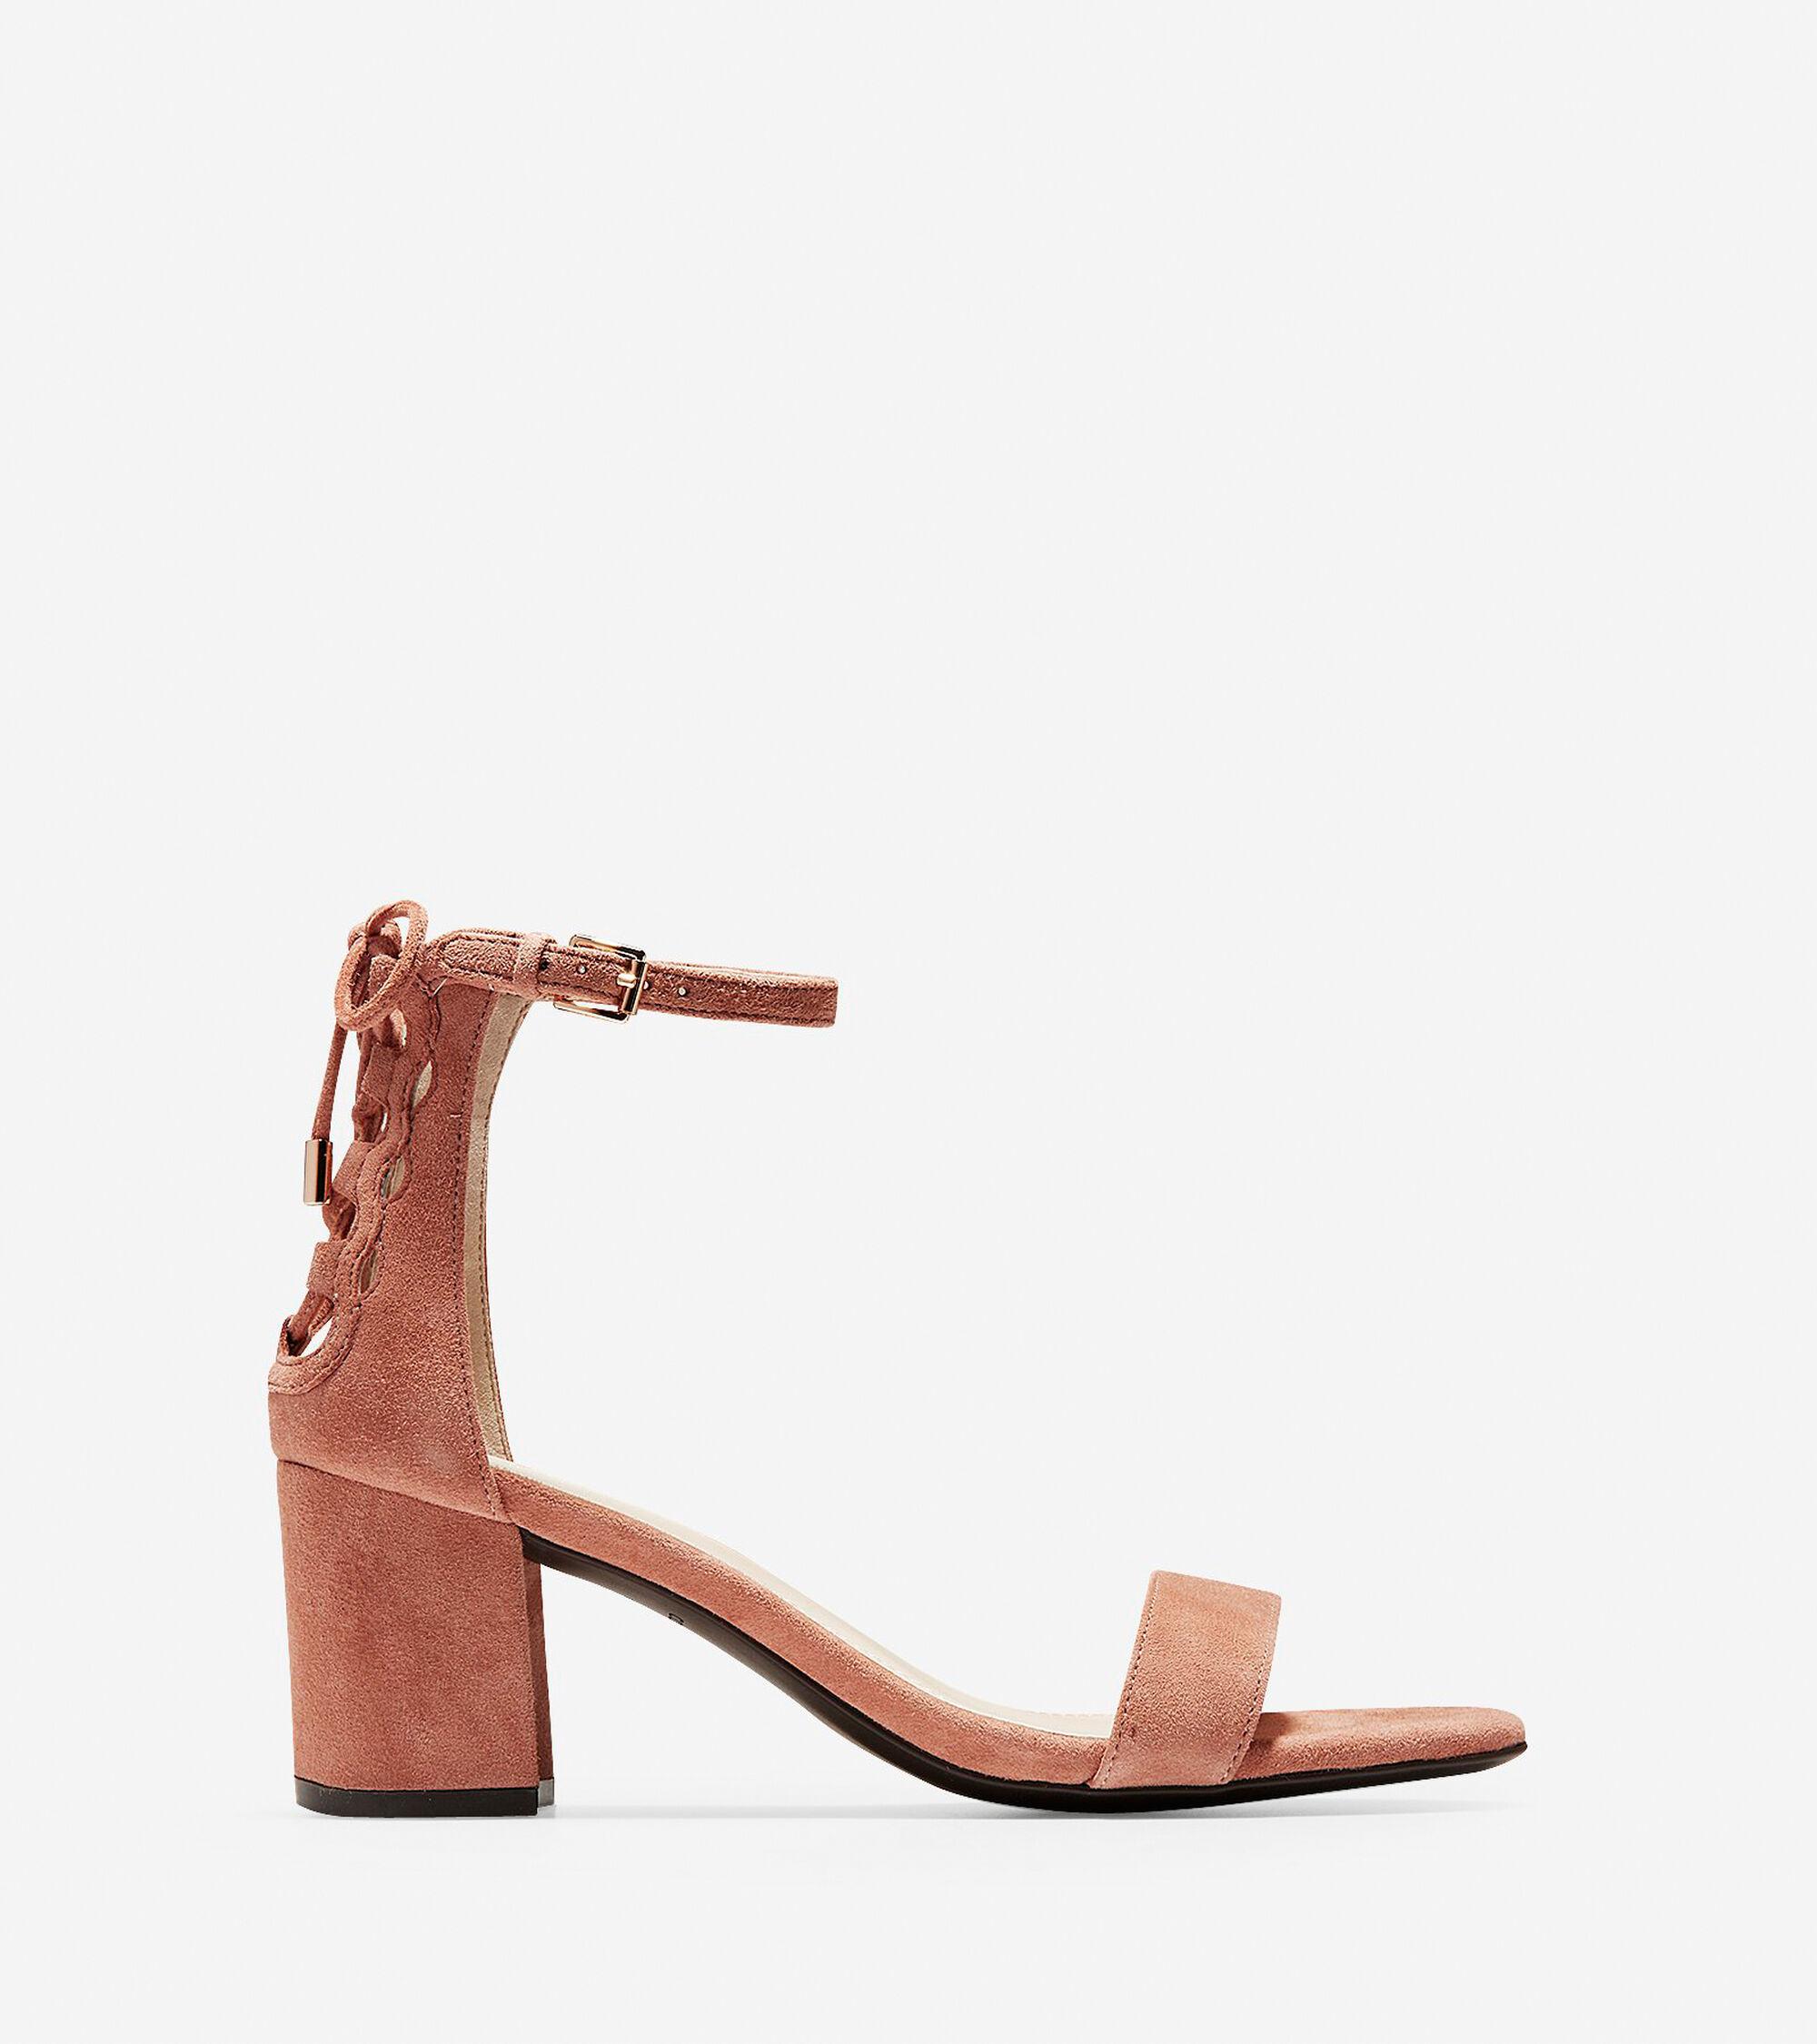 53dbe8a9186 Women s Leah Sandals 55mm in Mocha Mousse